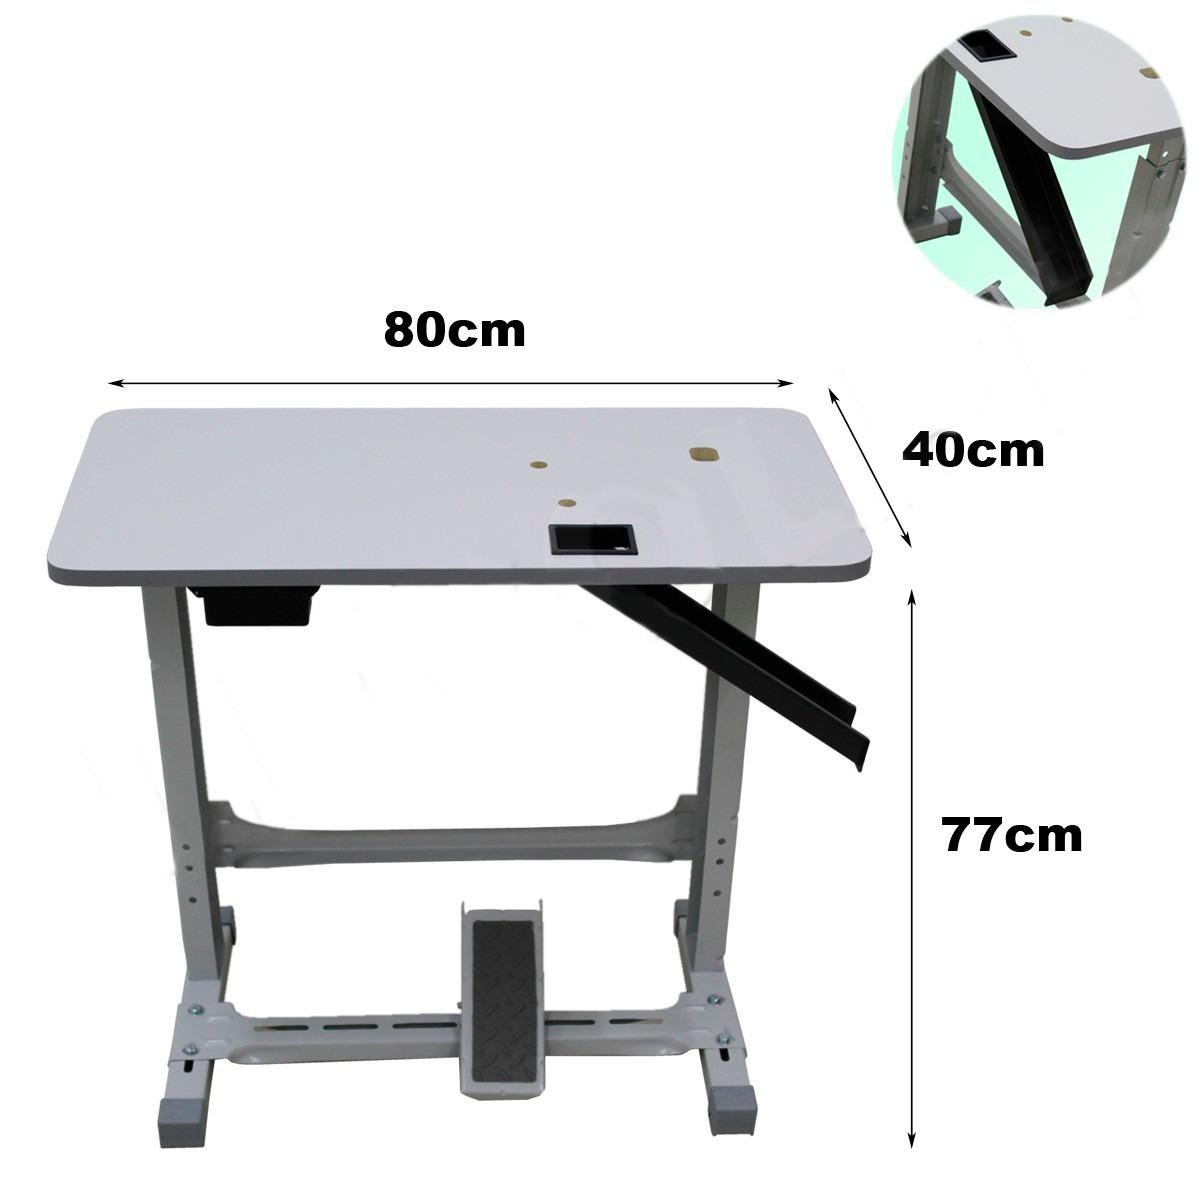 Mesa Bancada Para Máquina Costura Overlock Chinesinha Gn1